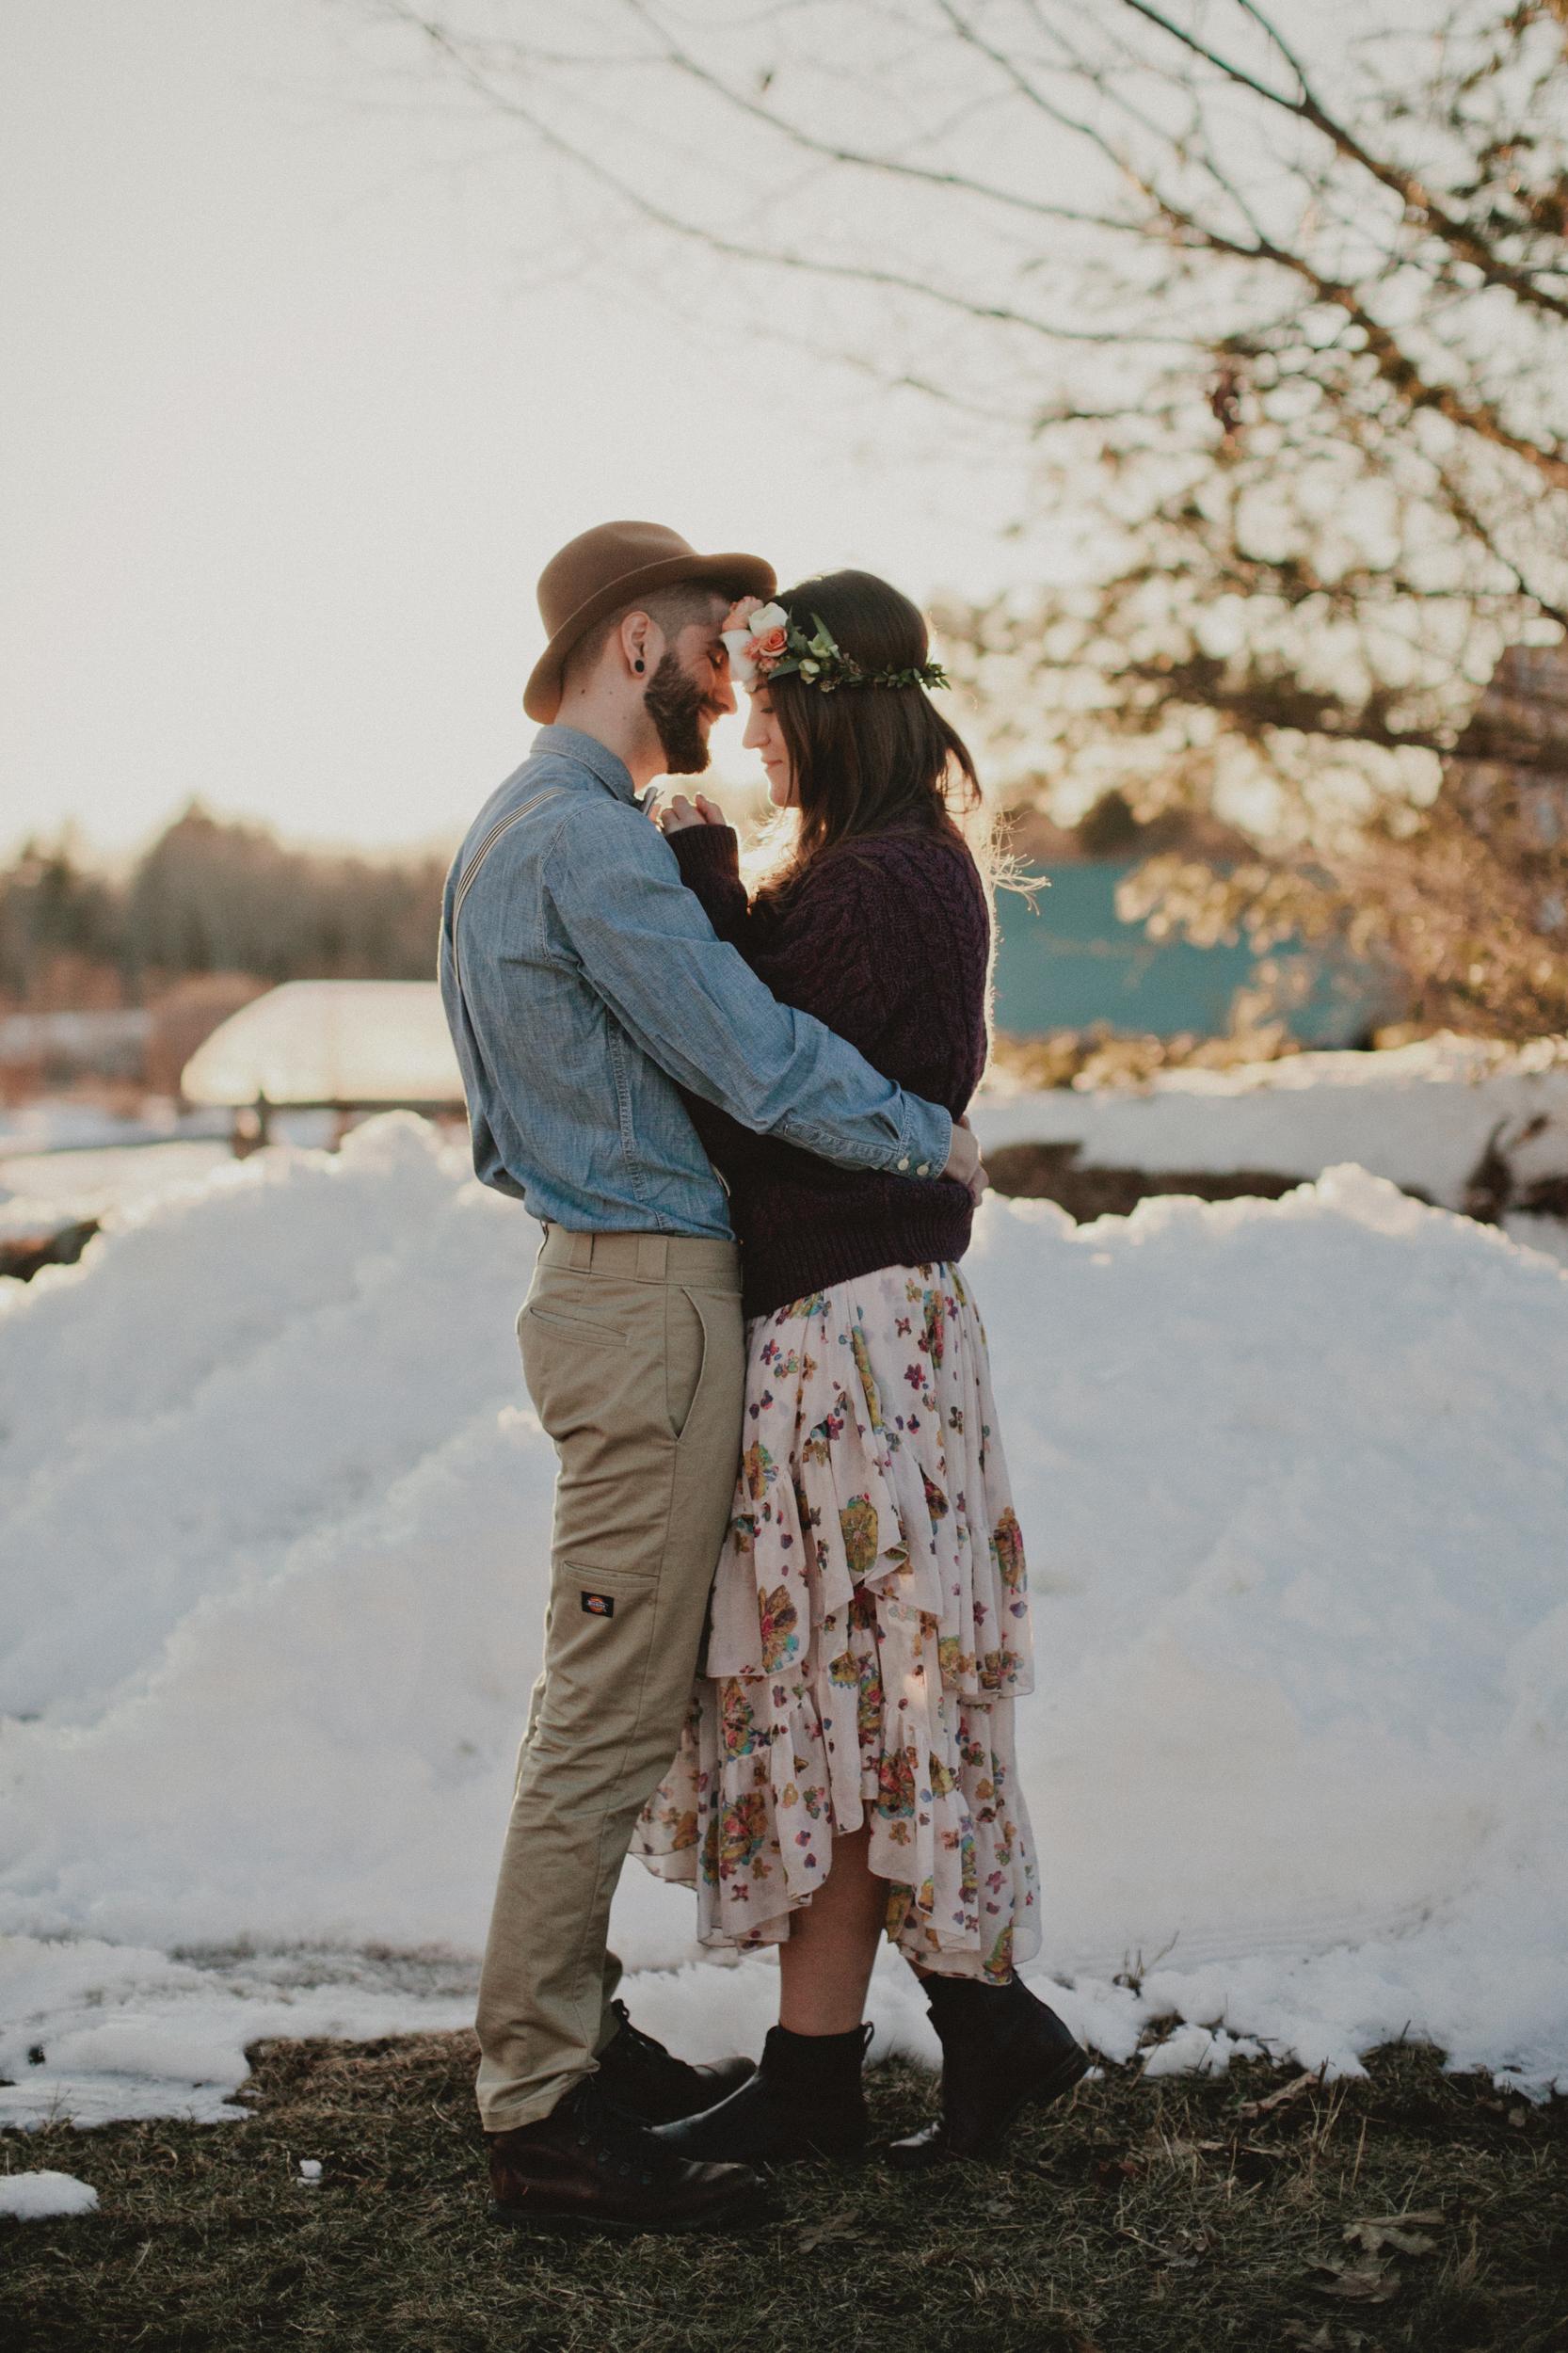 Maine-elopement-photos-118.jpg